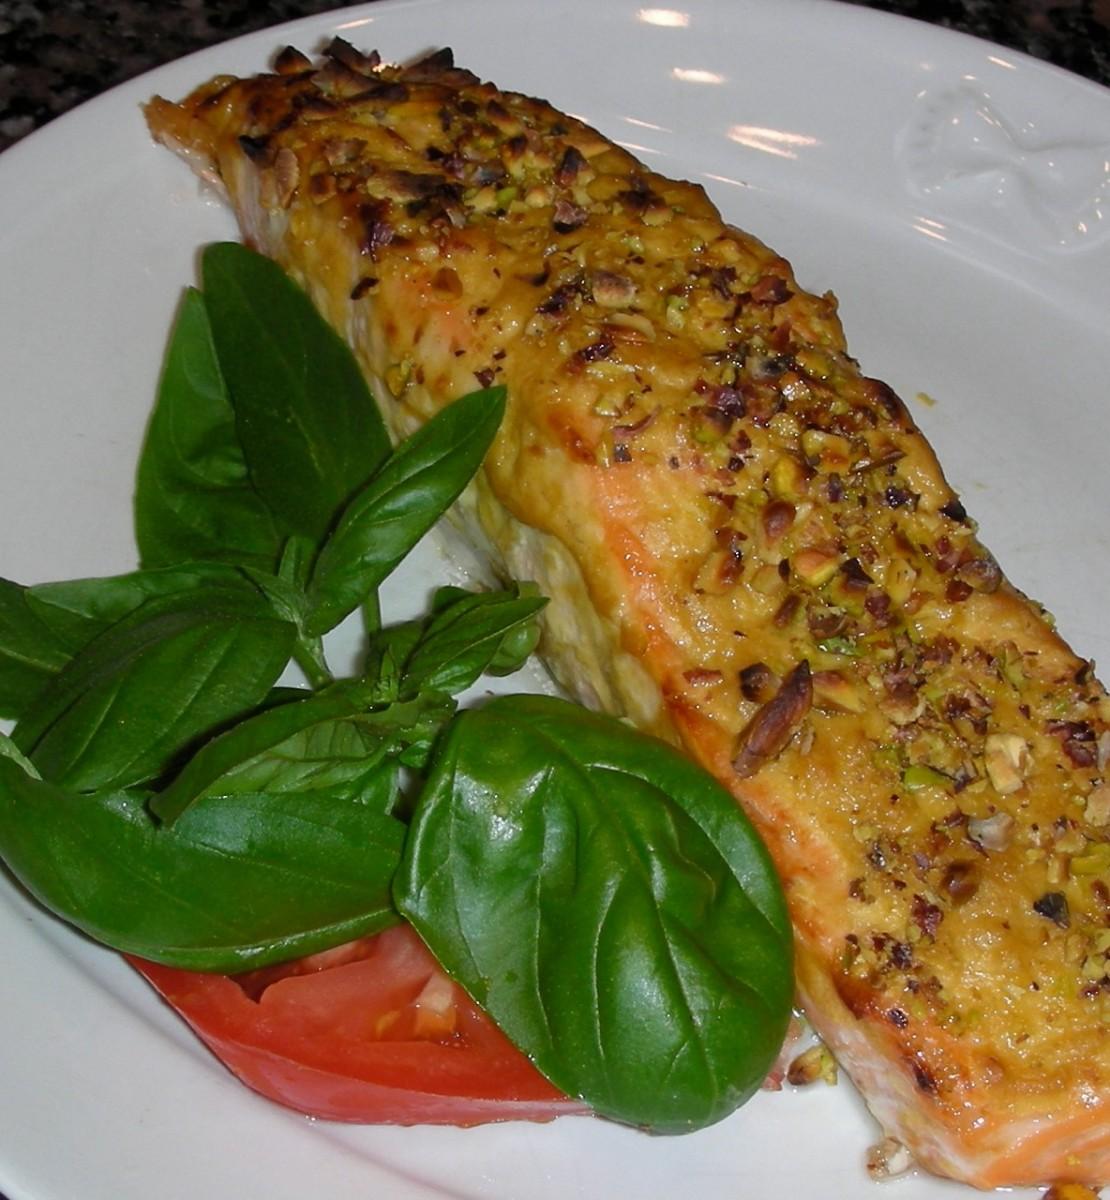 Roasted Pistachio-Crusted Salmon